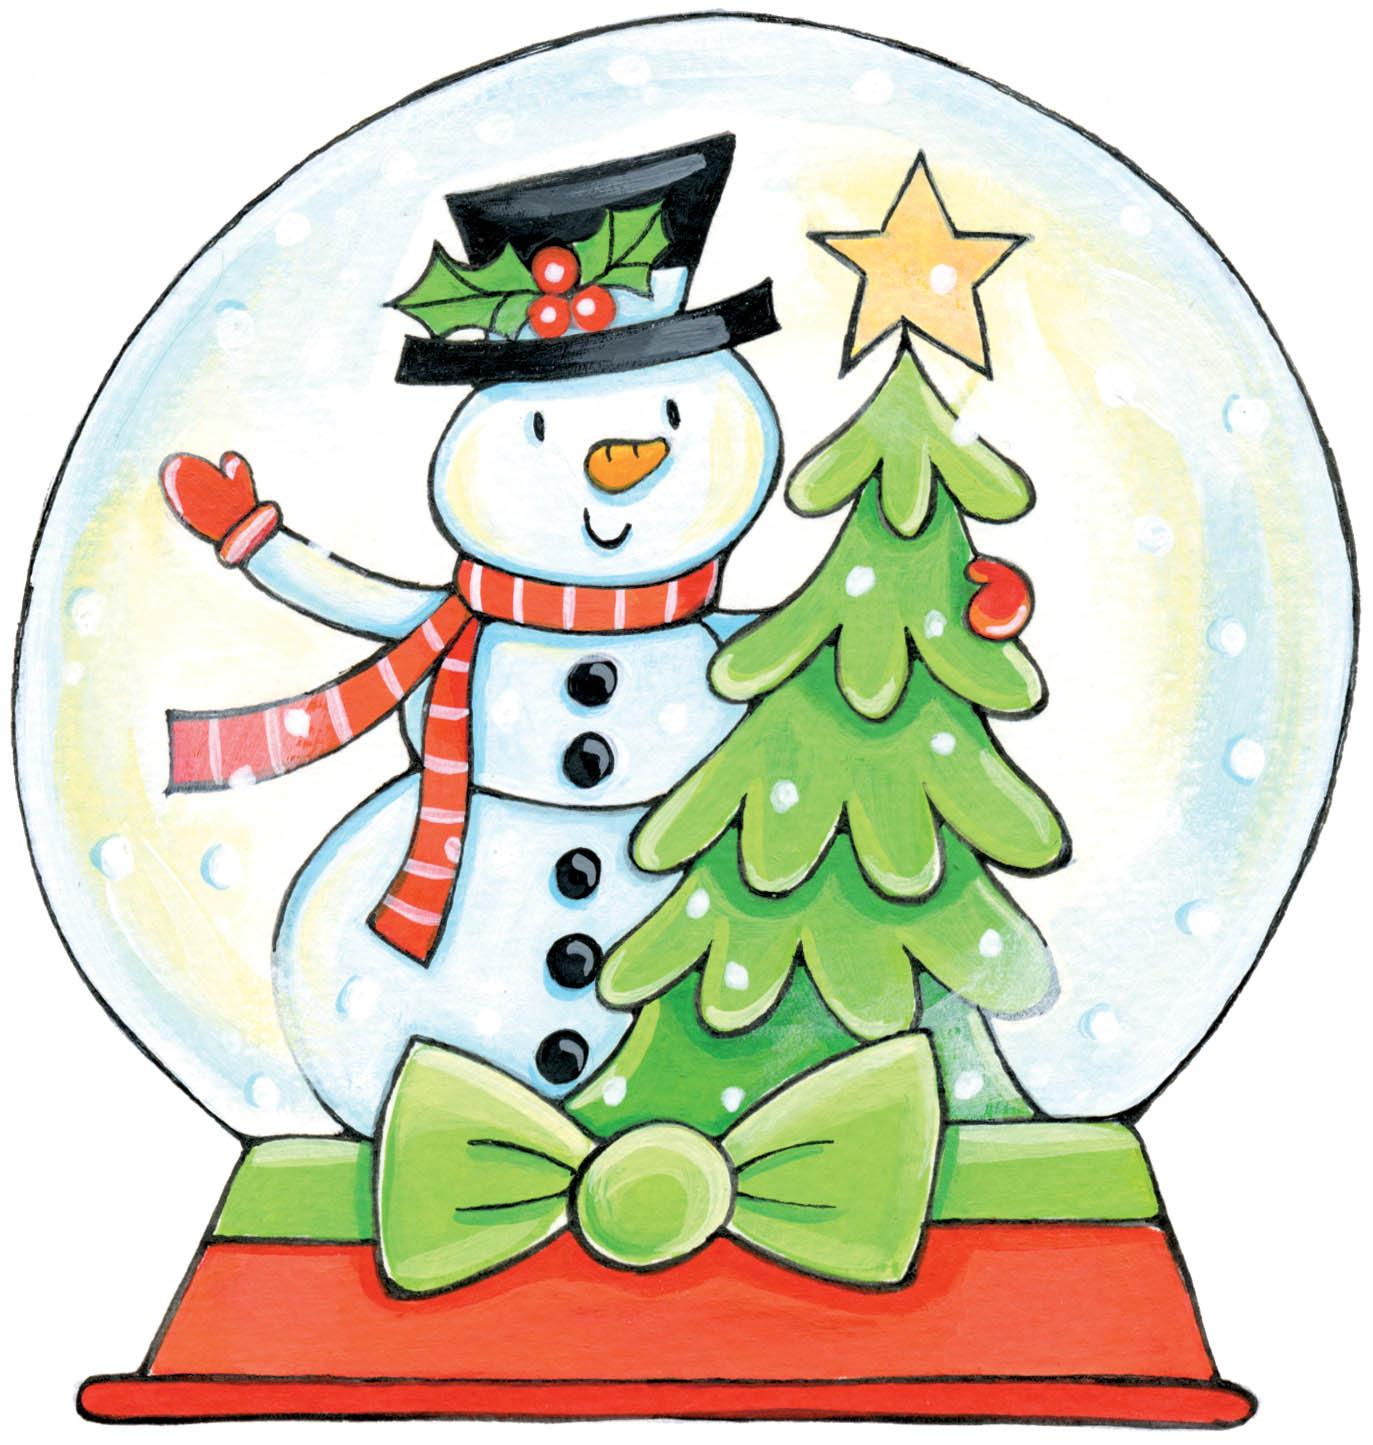 design christmas clip art of santa going snow skiing by dennis cox 152